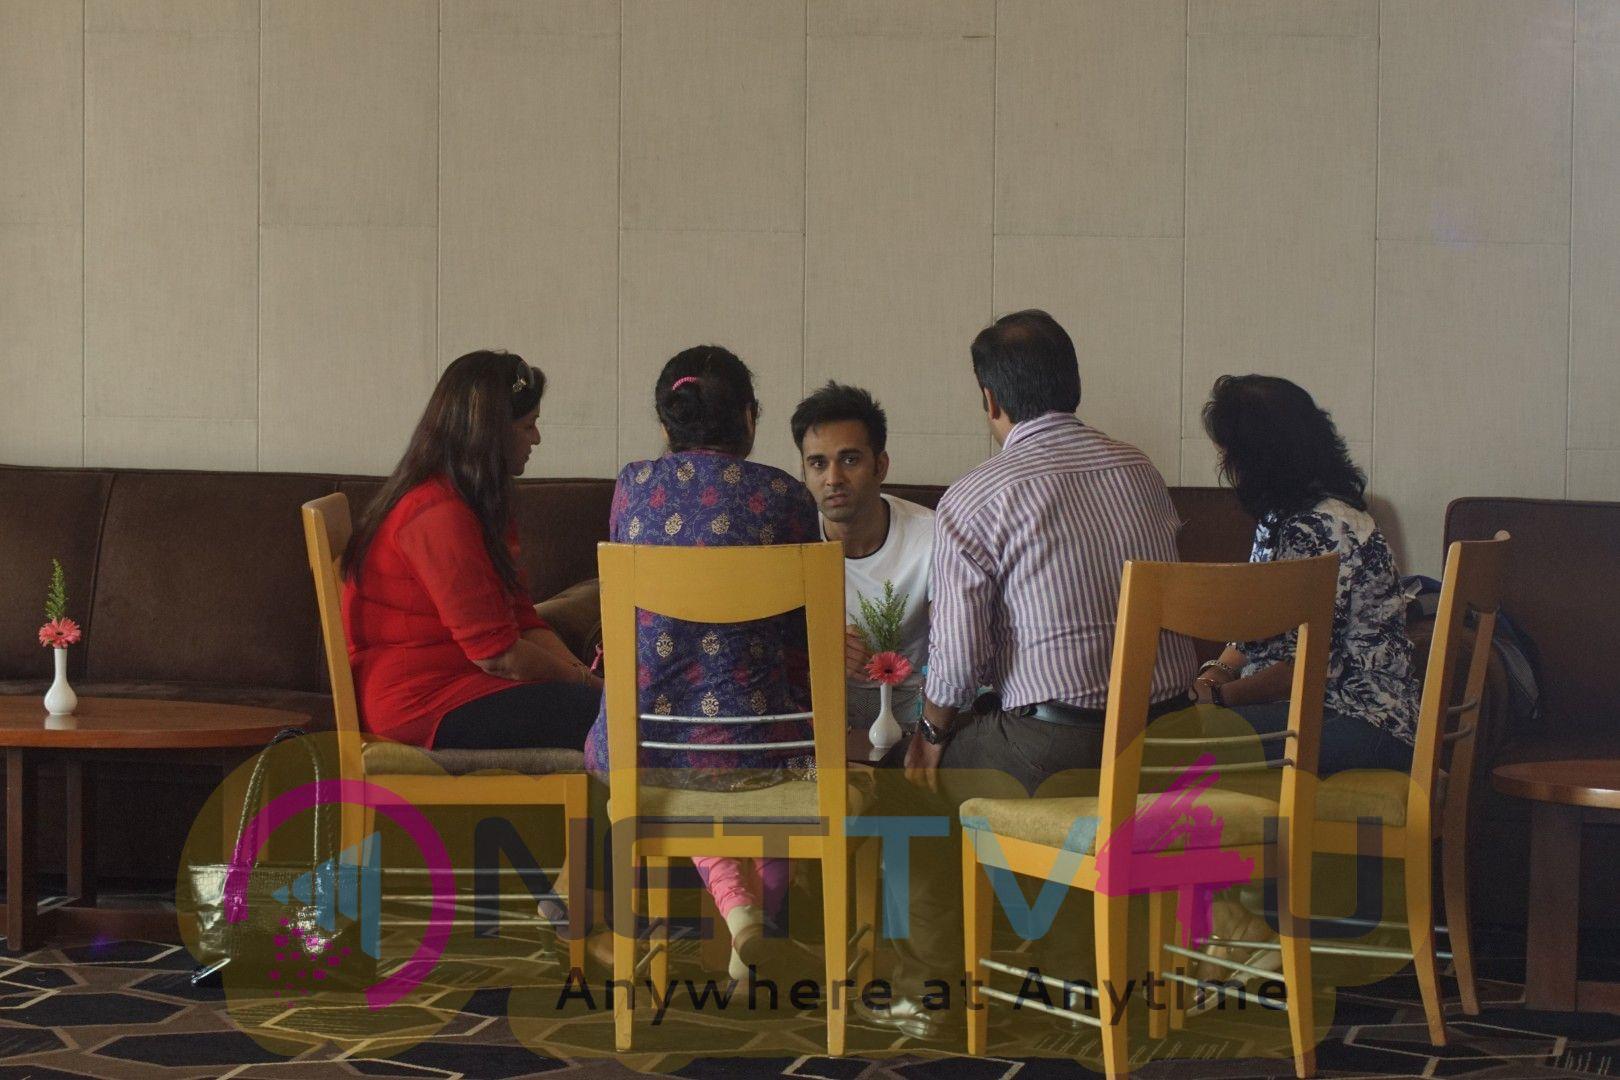 Pulkit Samrat & Kriti Kharbanda Spotted Promoting Film Veerey Ki Wedding Hindi Gallery